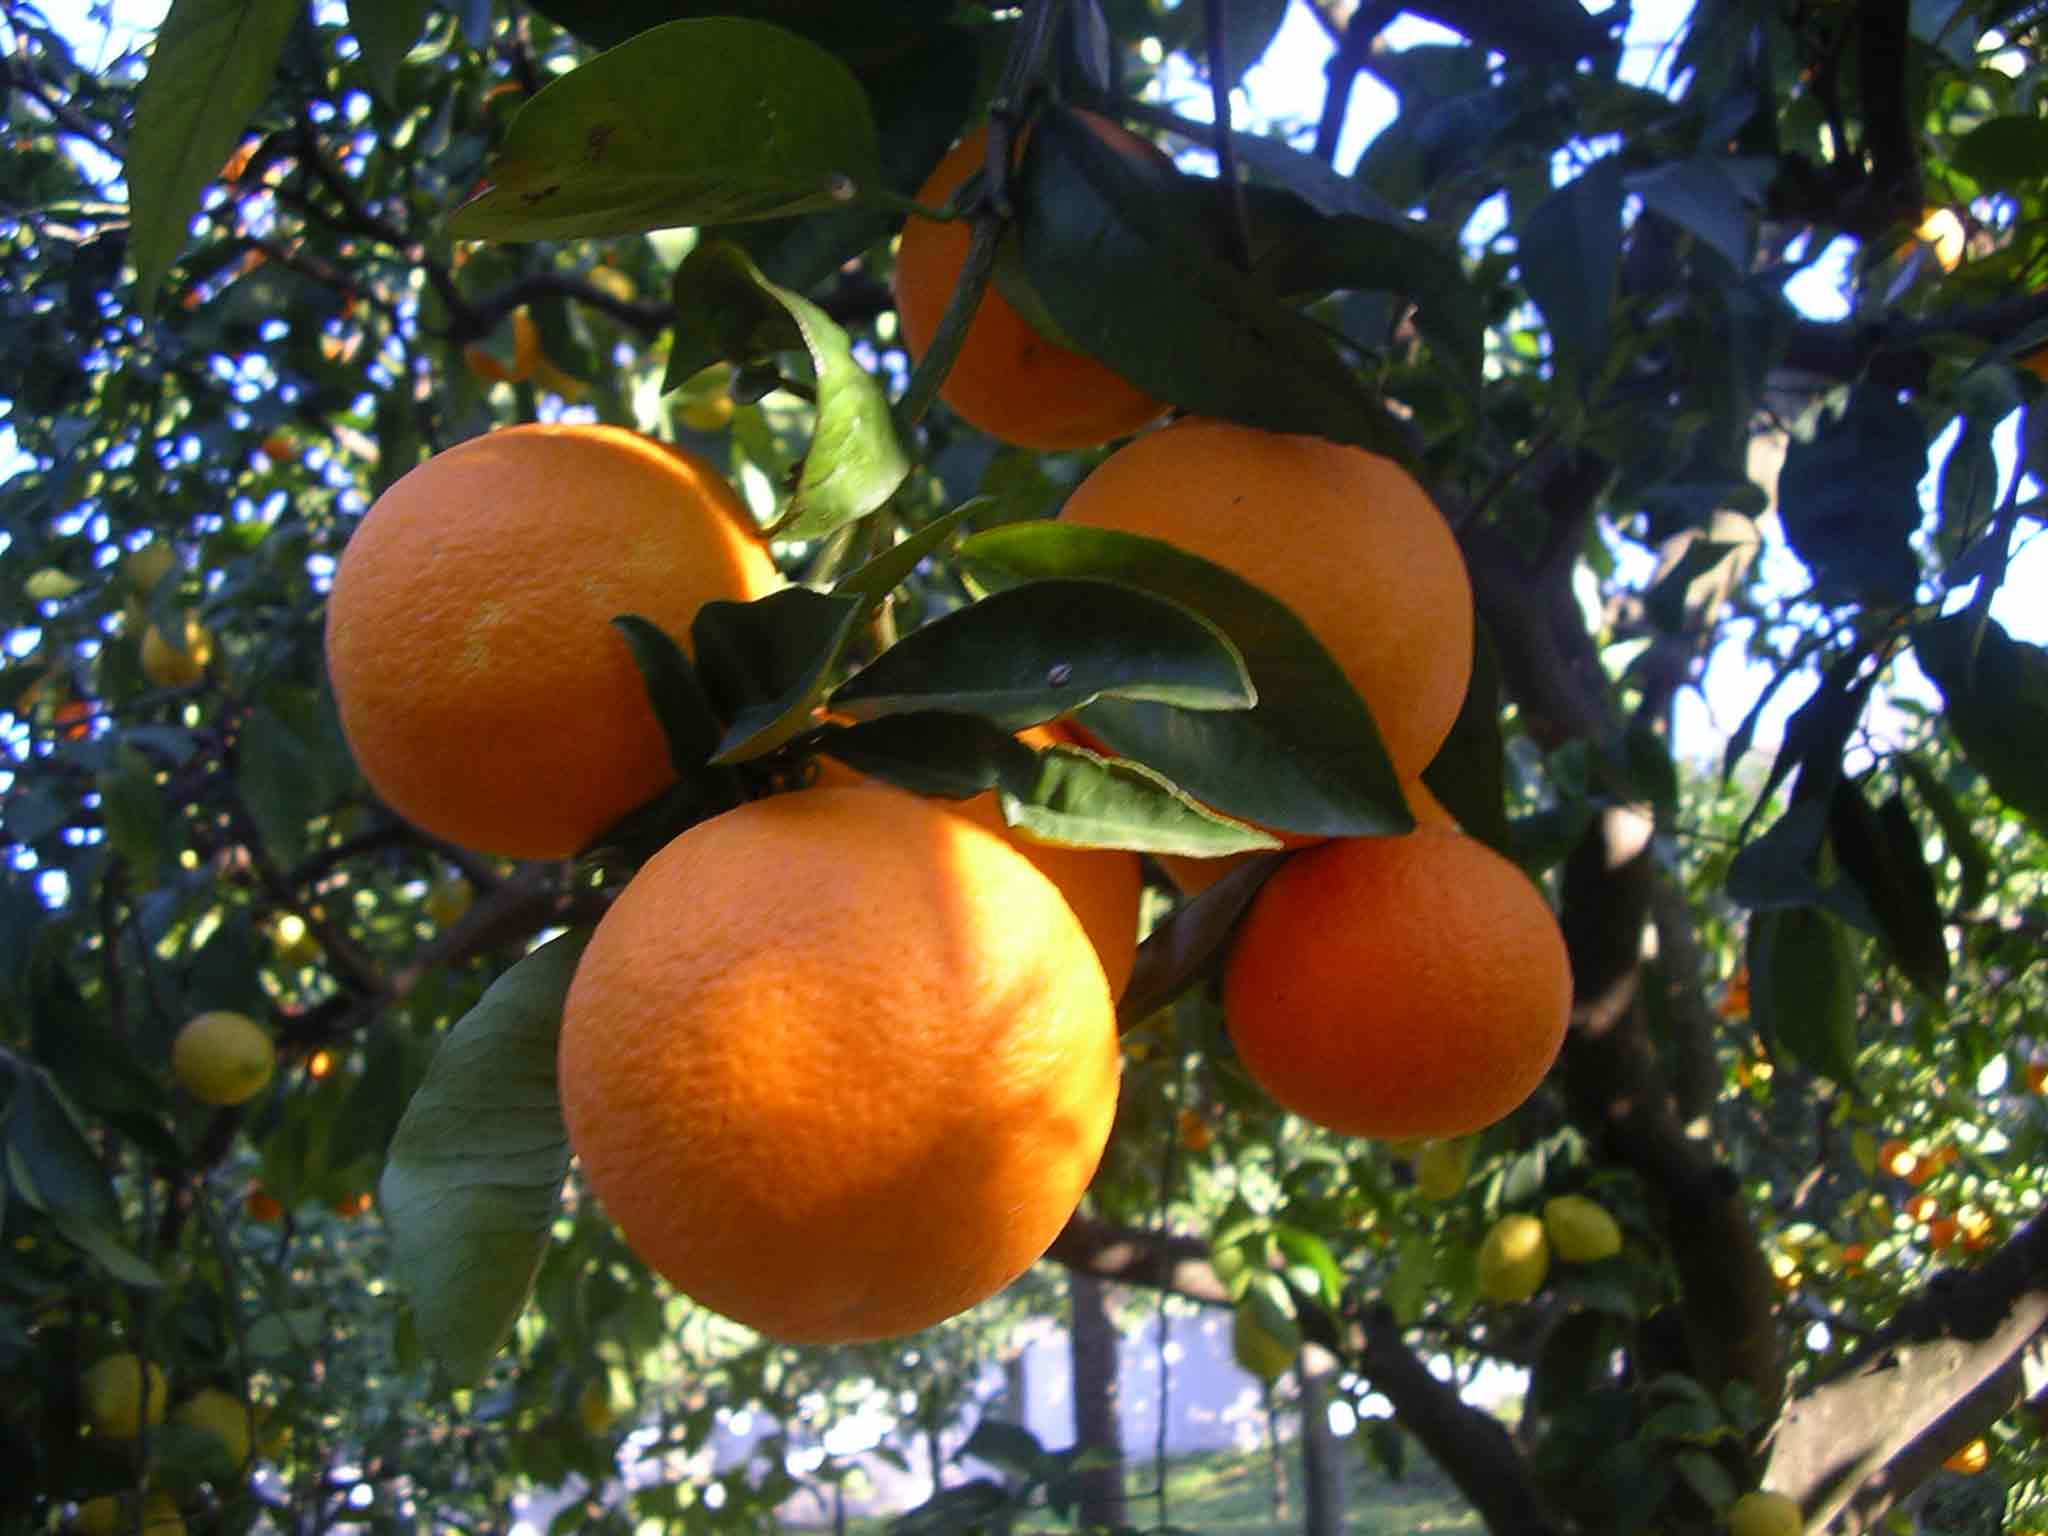 Si scrive arancie o arance?